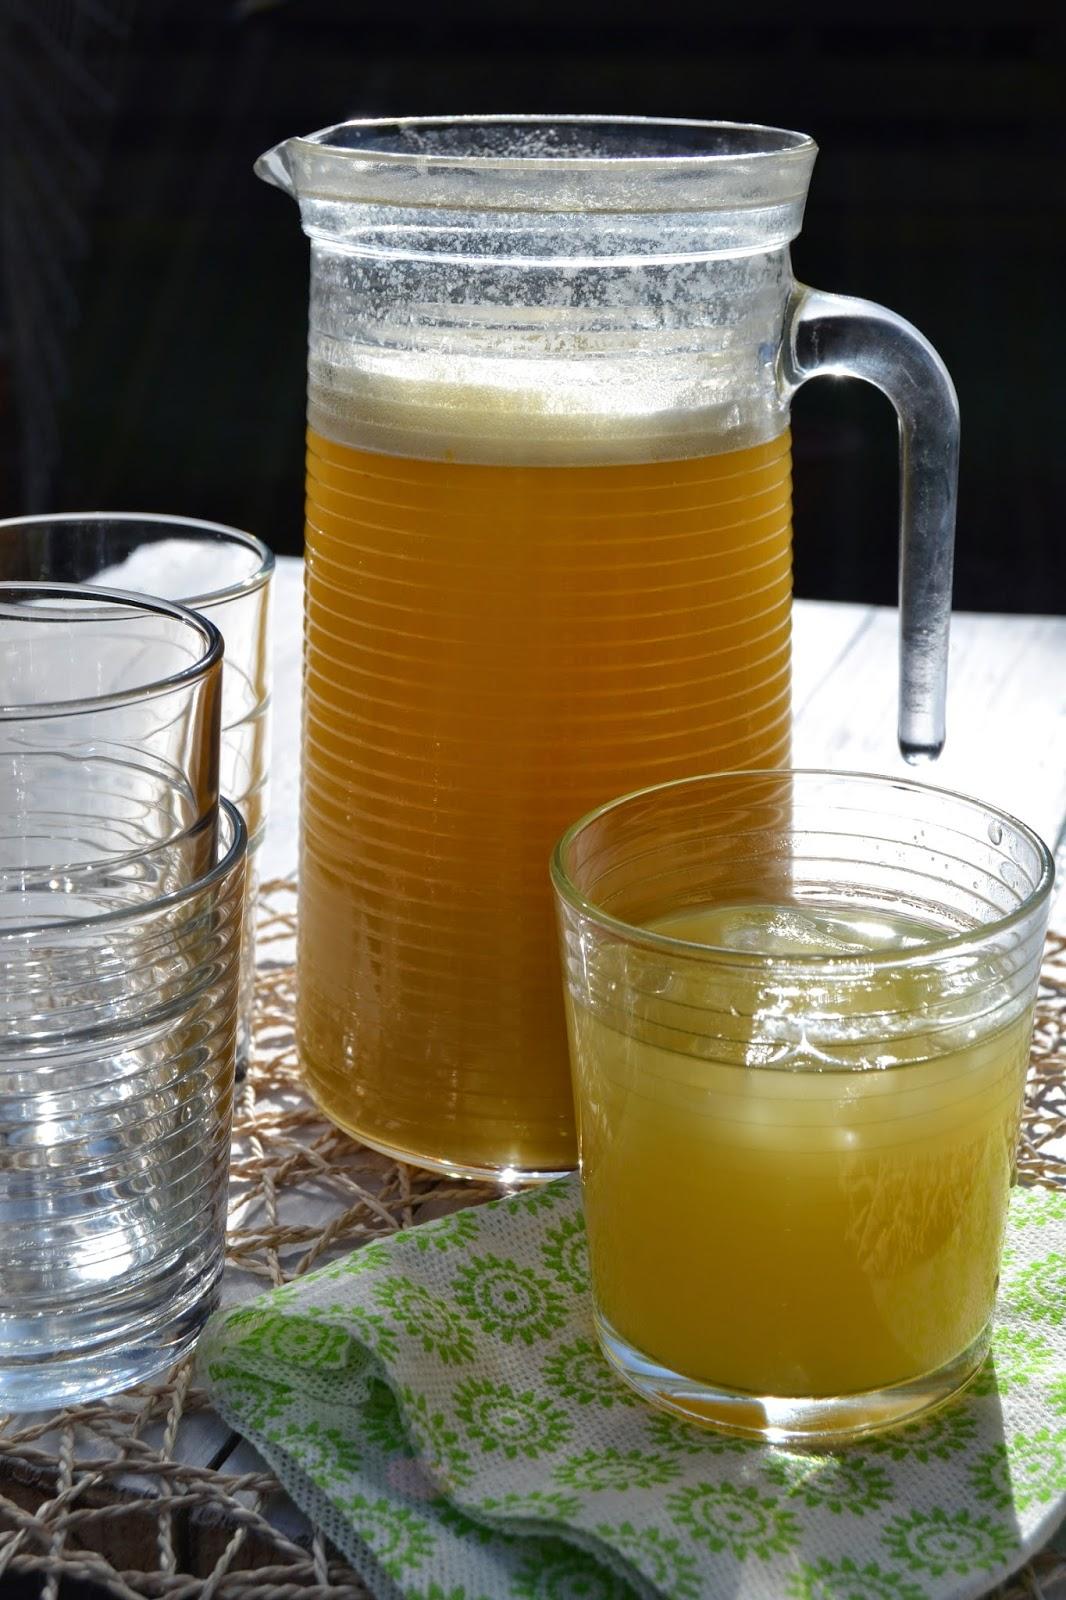 Fizzy pineapple drink